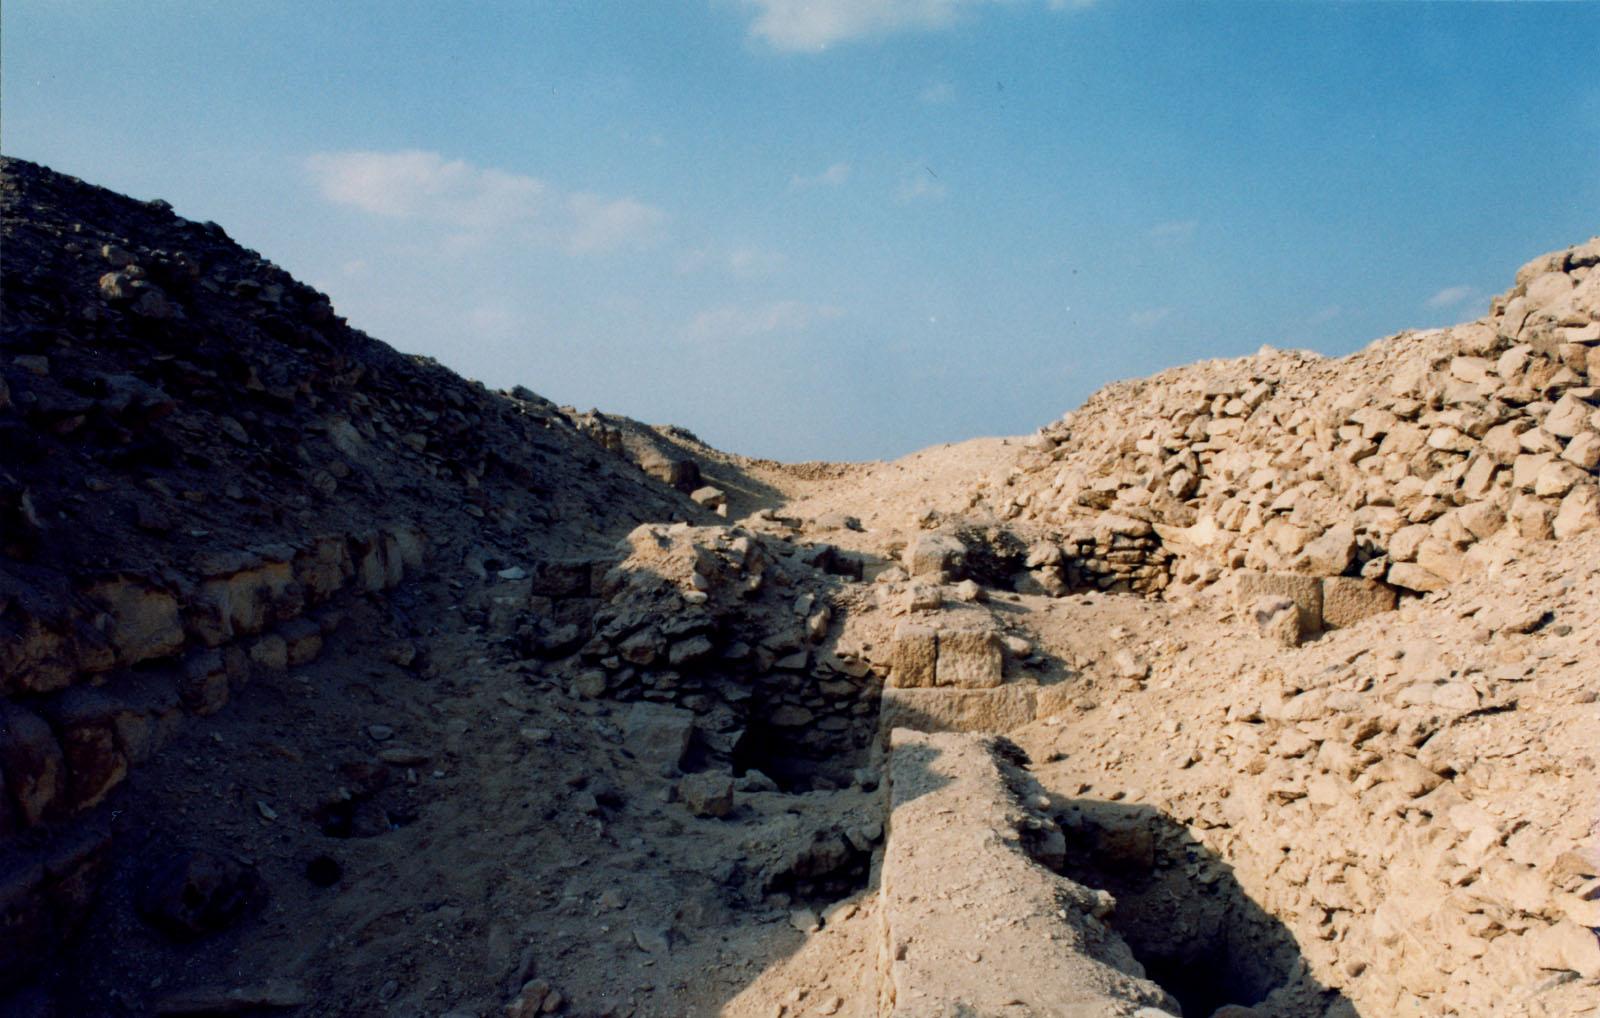 Western Cemetery: Site: Giza; View: G 2170, G 2169, G 2171, G 2172, G 2173, G 2174